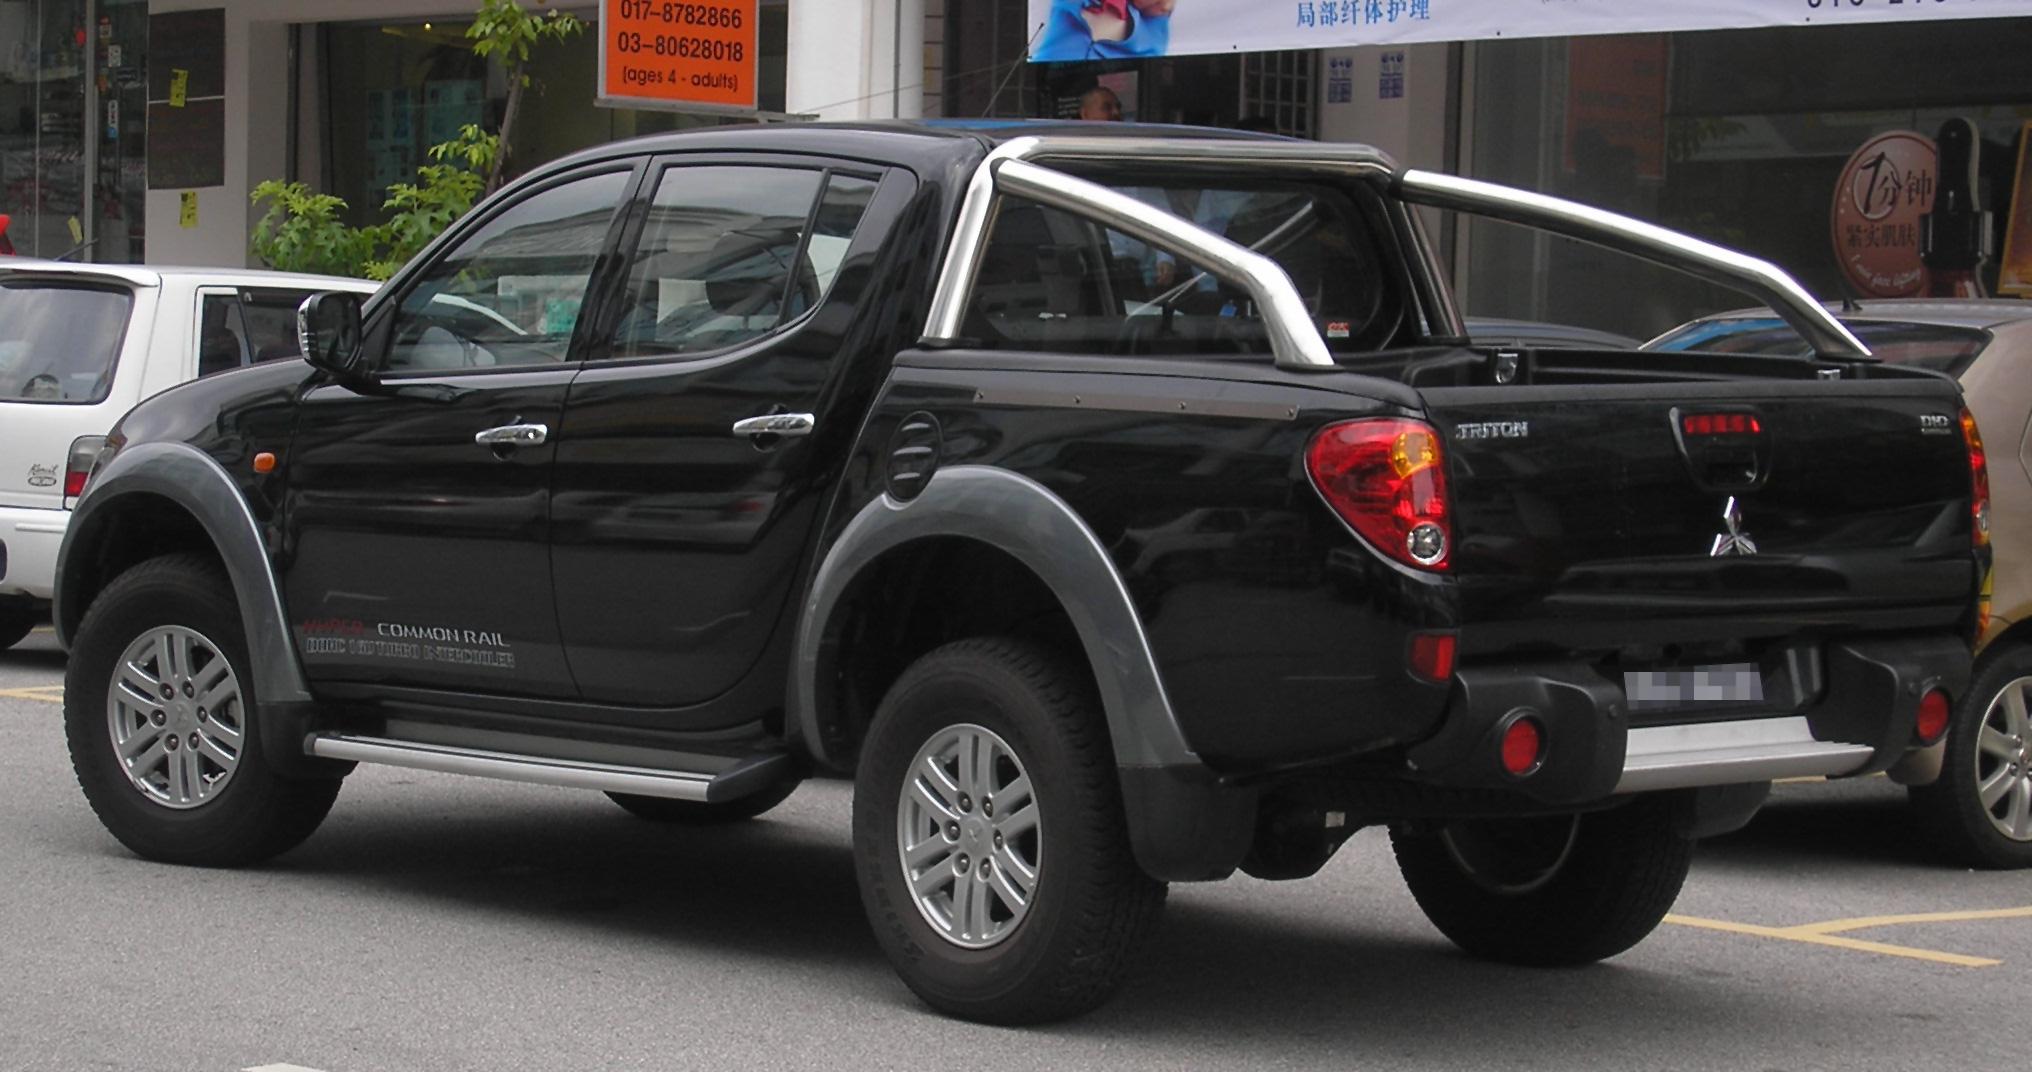 File:Mitsubishi Triton (first Generation) (rear), Serdang